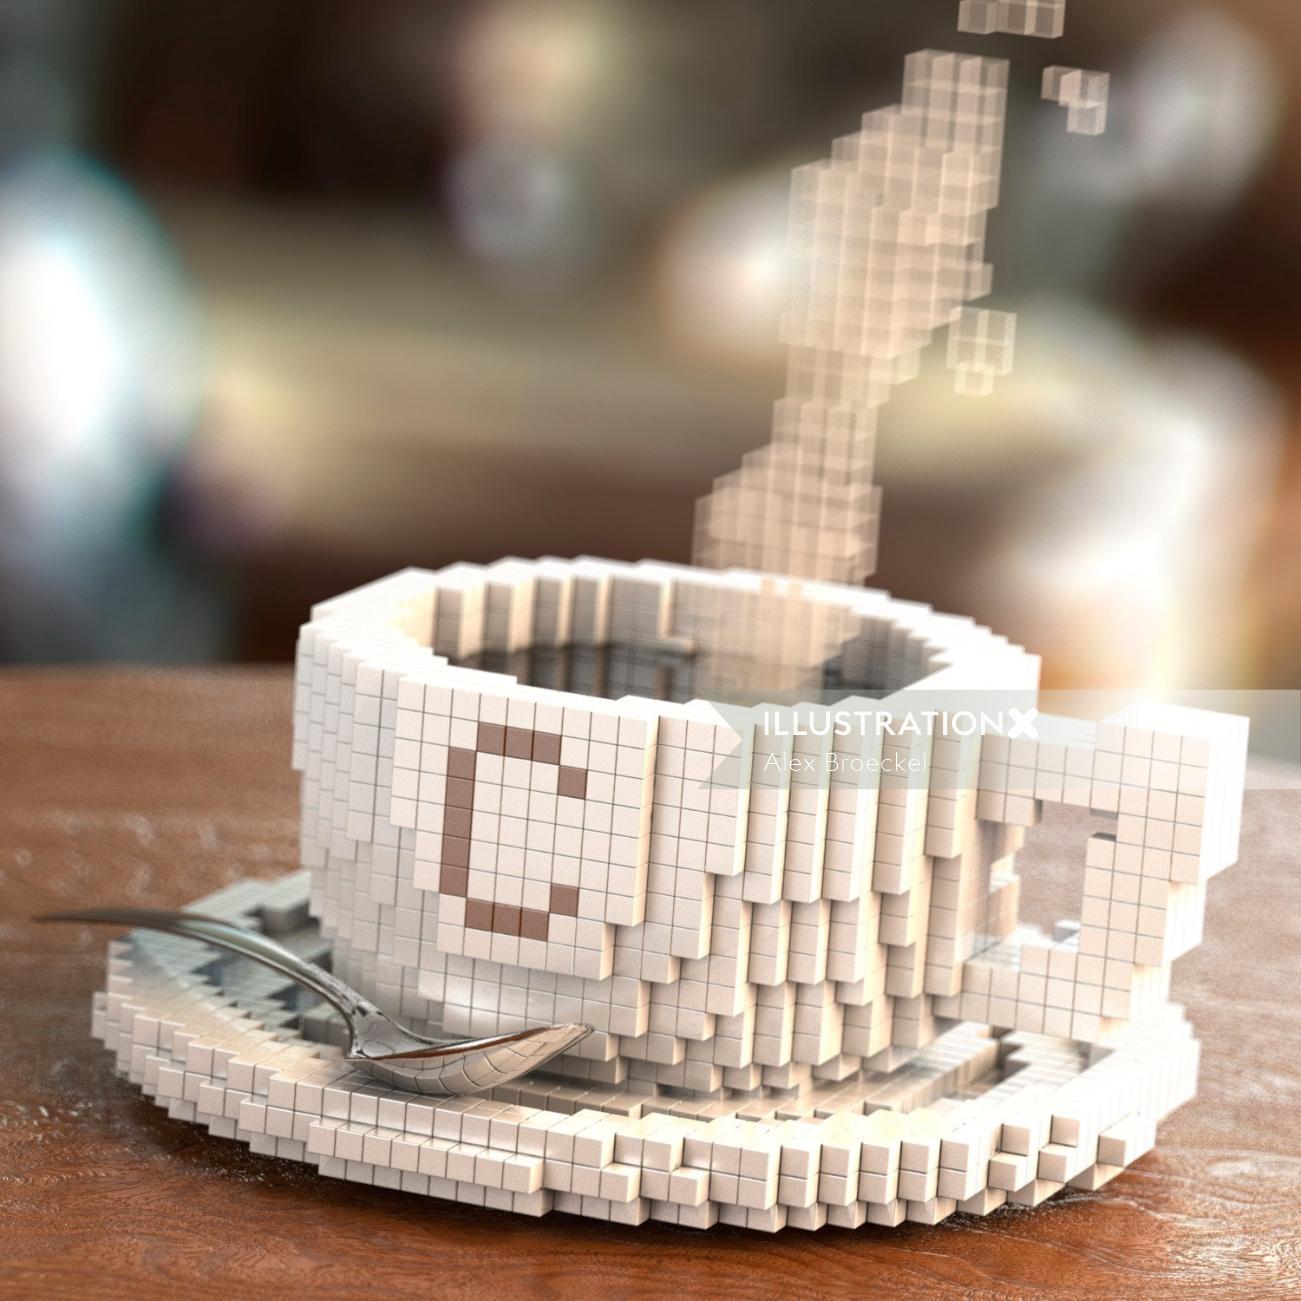 Pixel Coffee Illustration